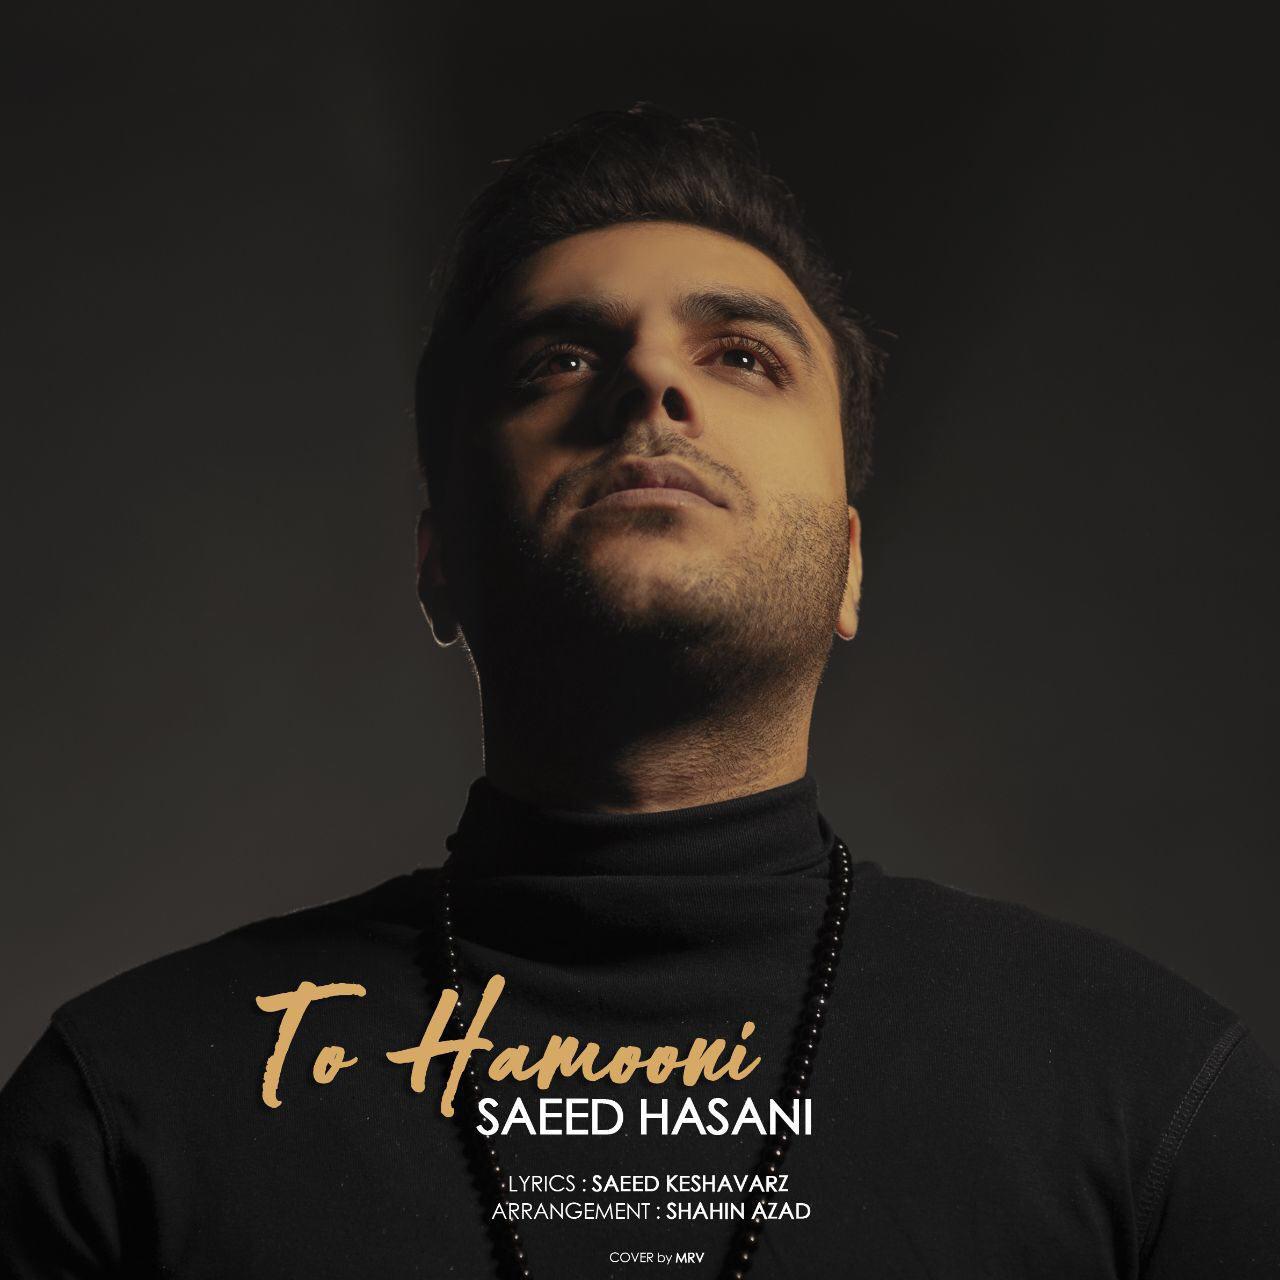 Saeed Hasani – To Hamooni